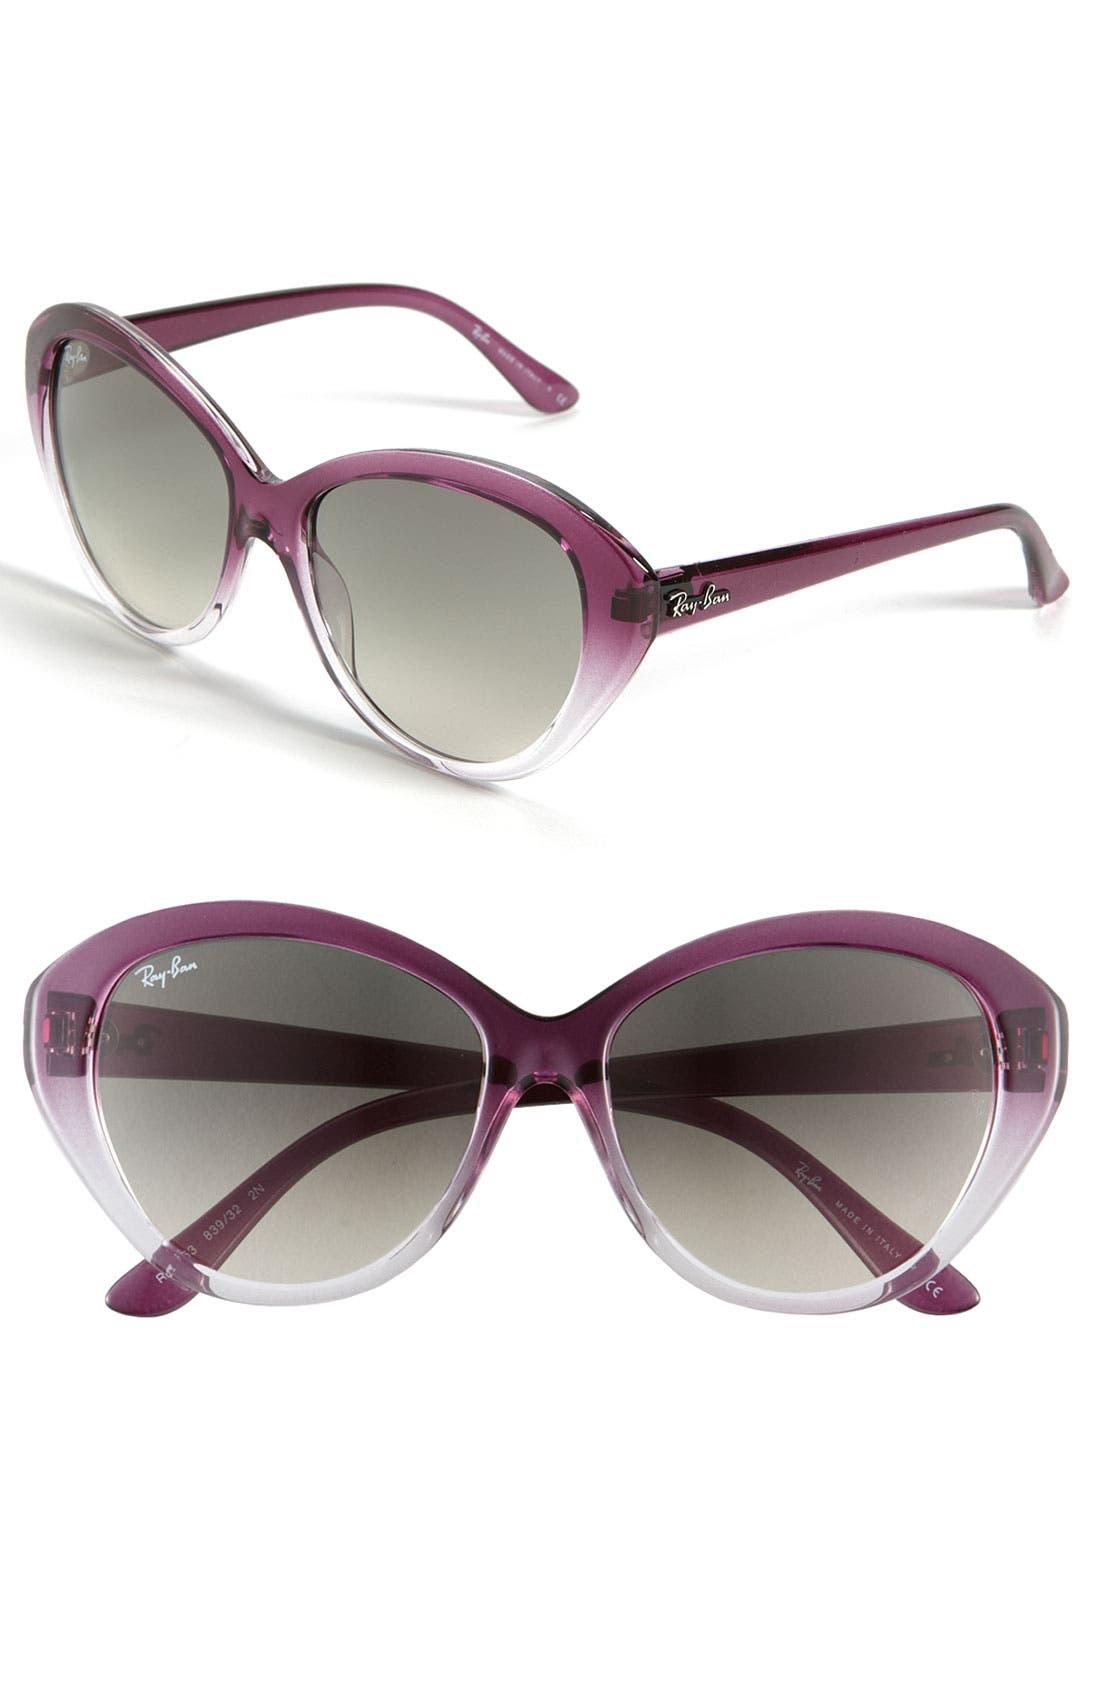 Main Image - Ray-Ban Retro Cat's Eye Sunglasses